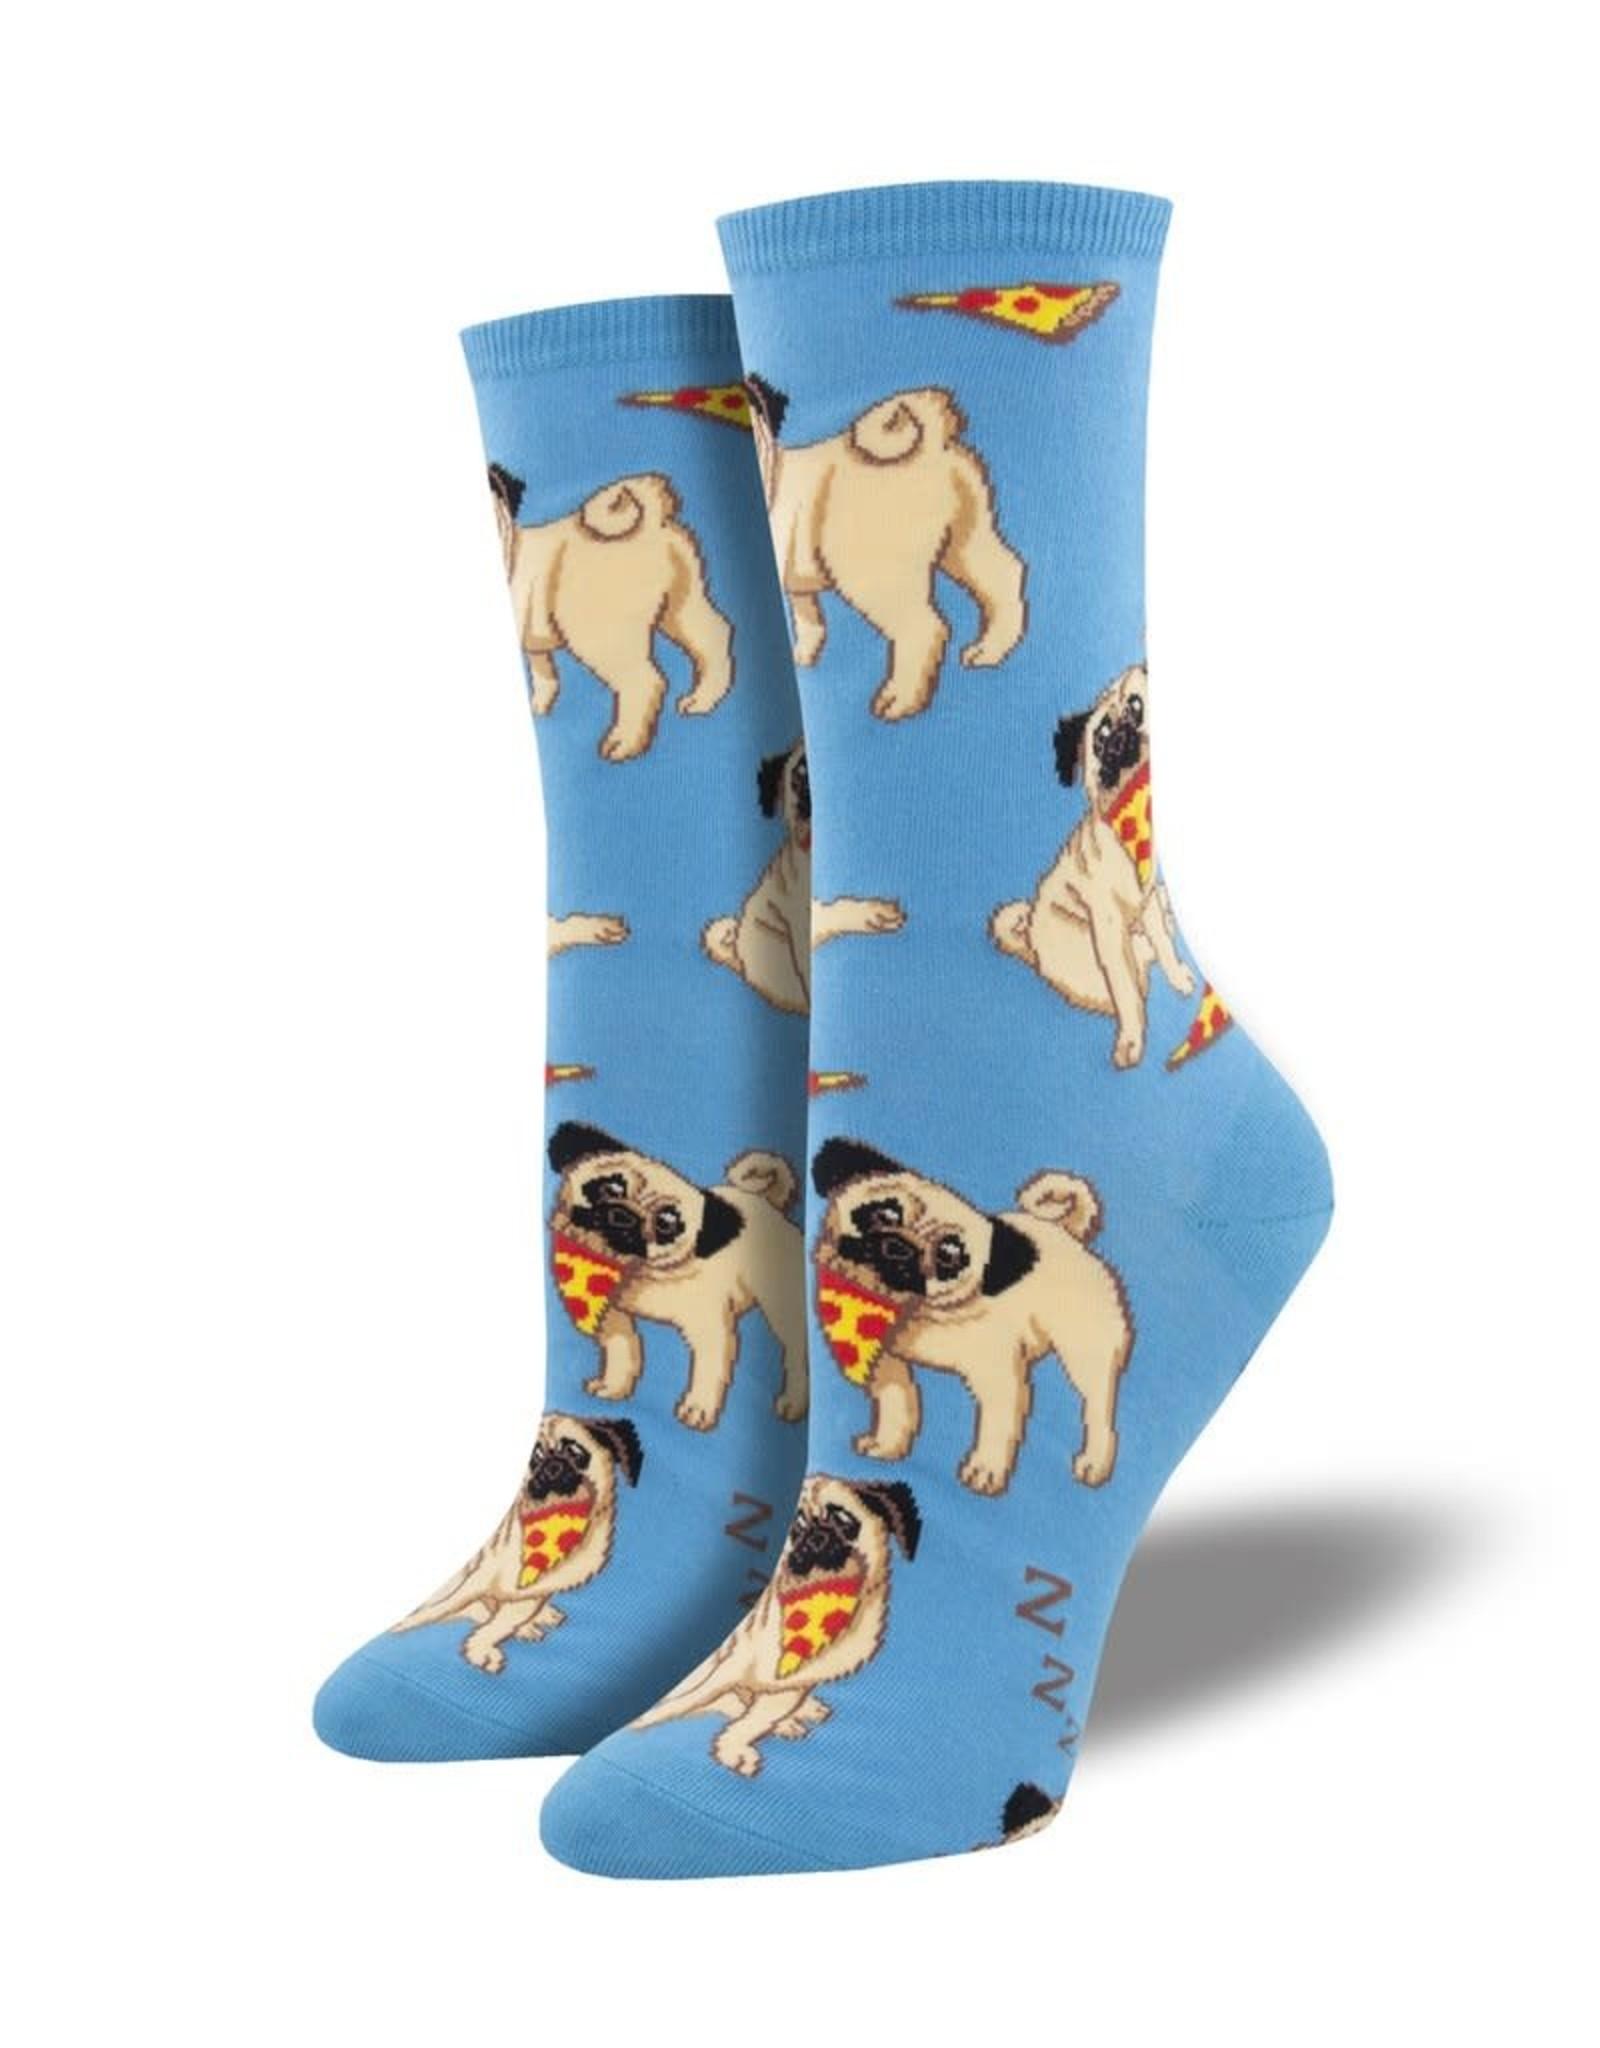 Socks (Womens) - Pug With Pizza